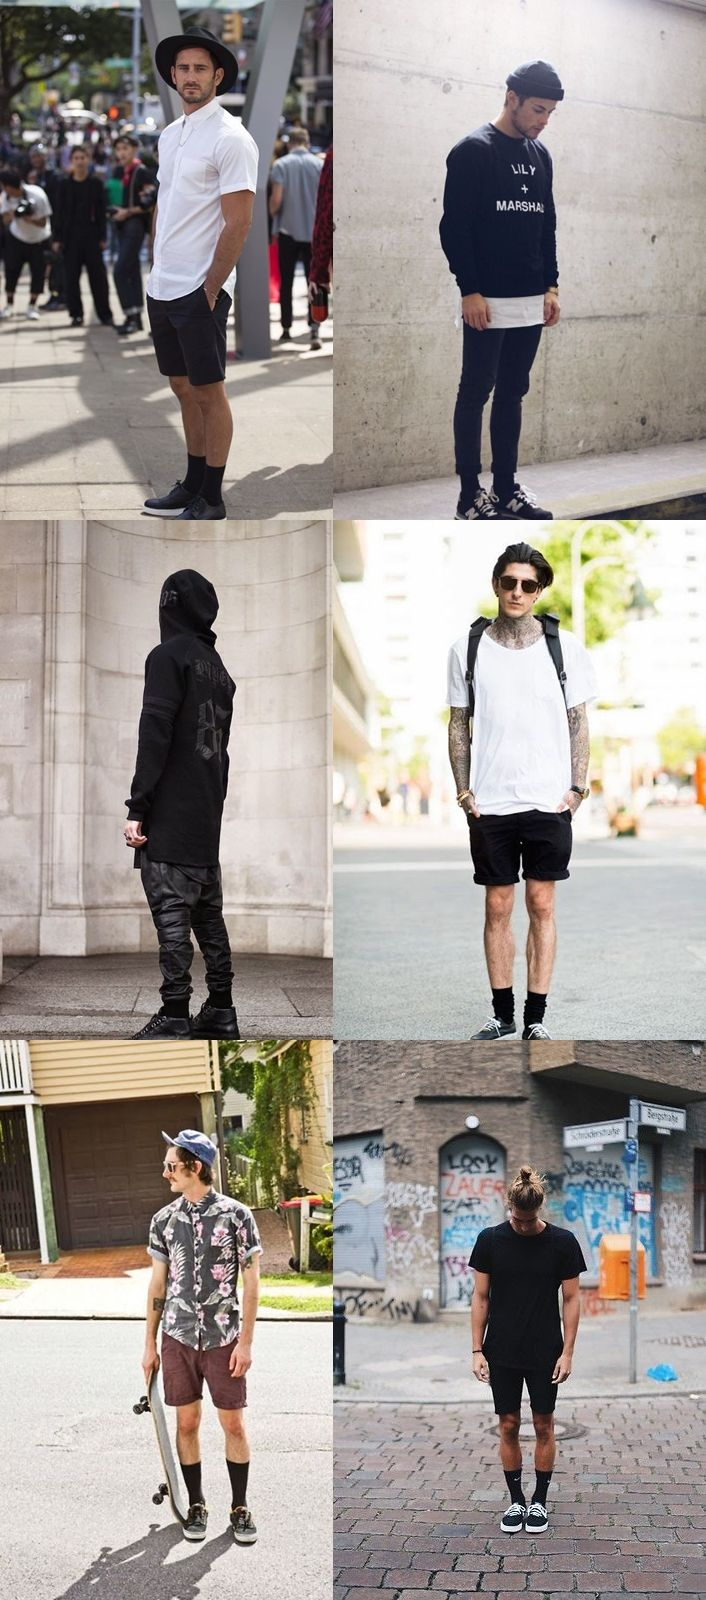 meia preta, meia cano alto, moda masculina, dicas de moda, look masculino 2018, ootd men, outfit, menswear, blogger, blog, estilo masculino, roupa masculina, acessório masculino, mens, homens, blog de moda masculina,